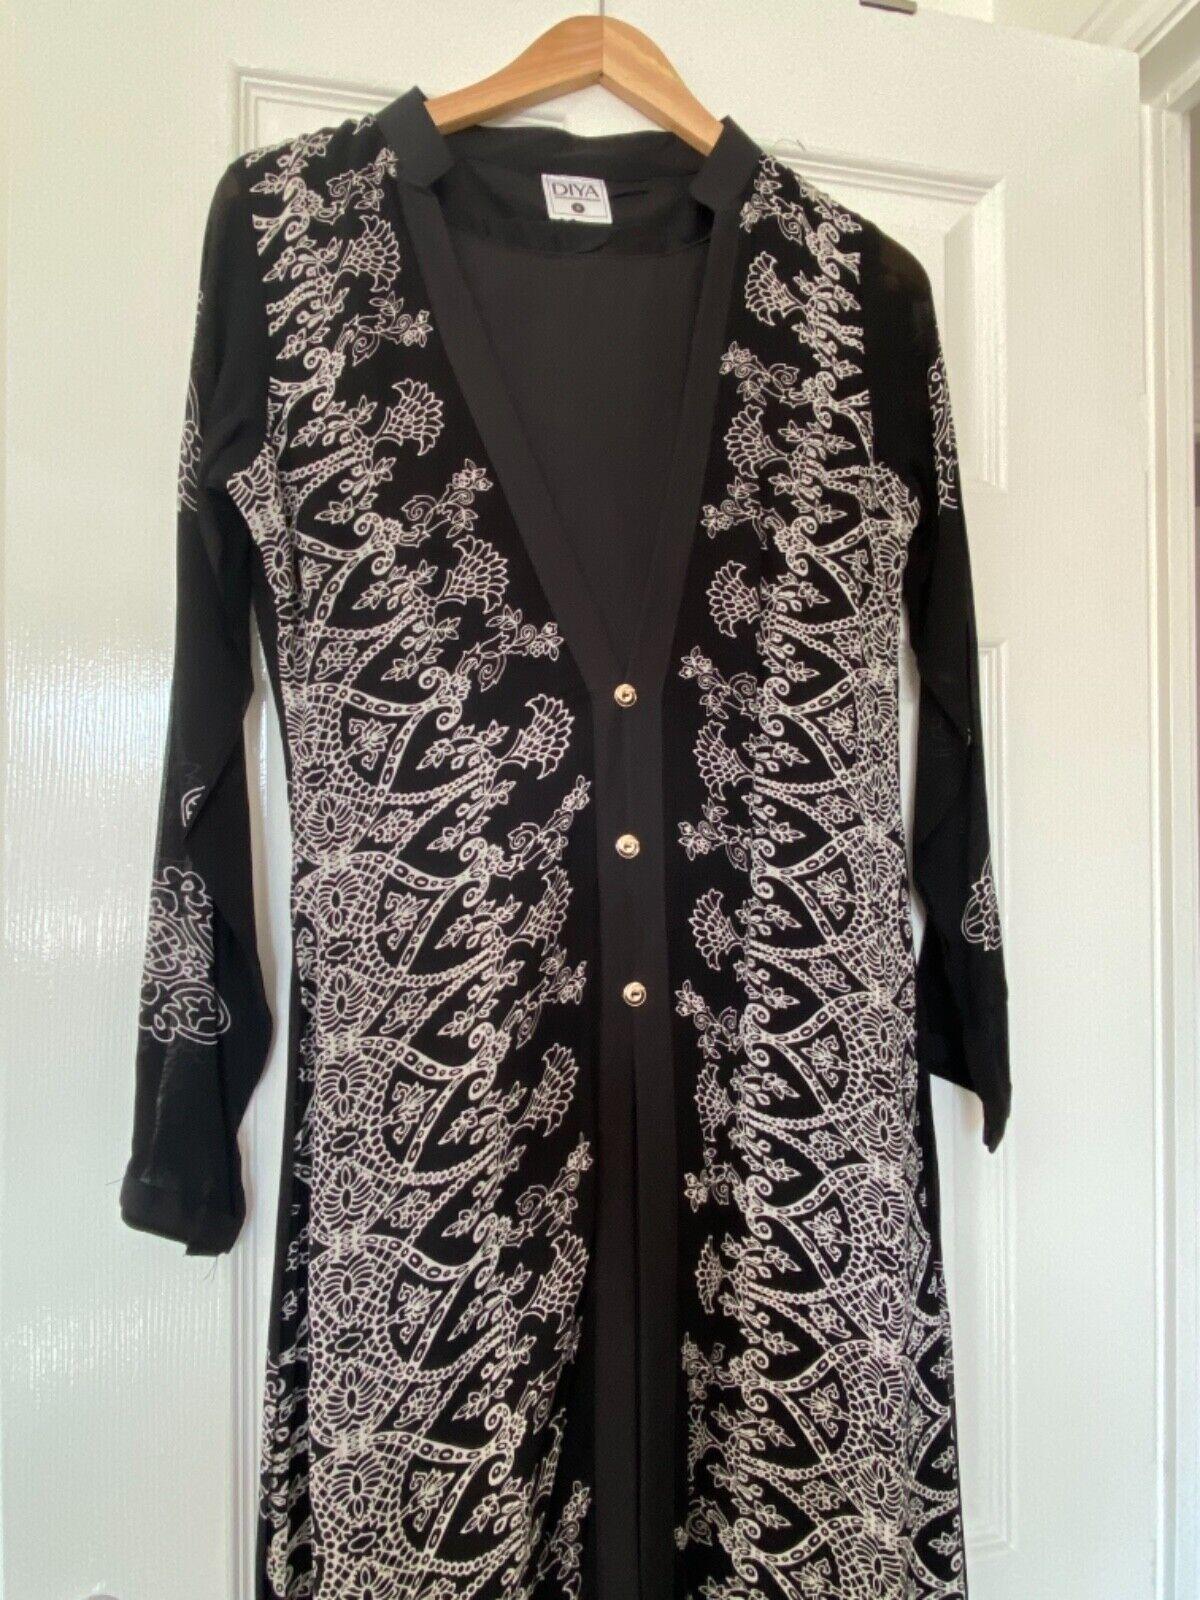 Clearance Modest Black Ladies Maxi Churidar/Shalwar Salwar Kameez, Size S